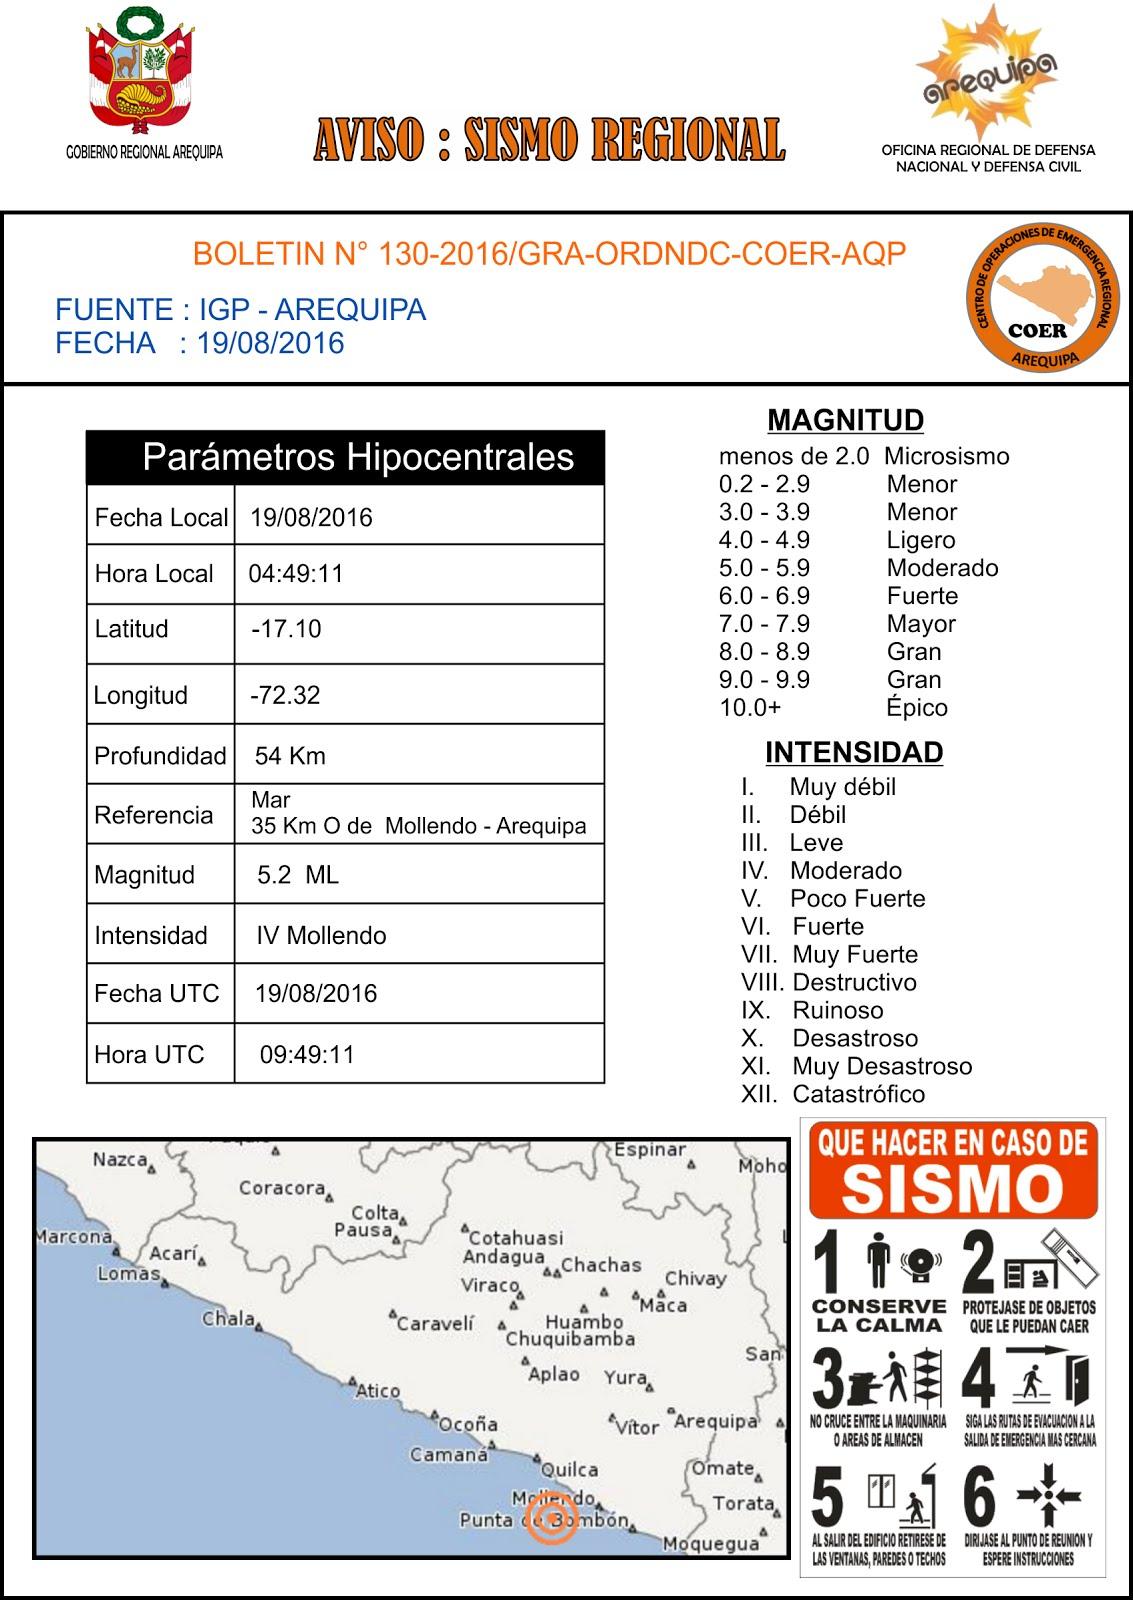 SISMO REGIONAL